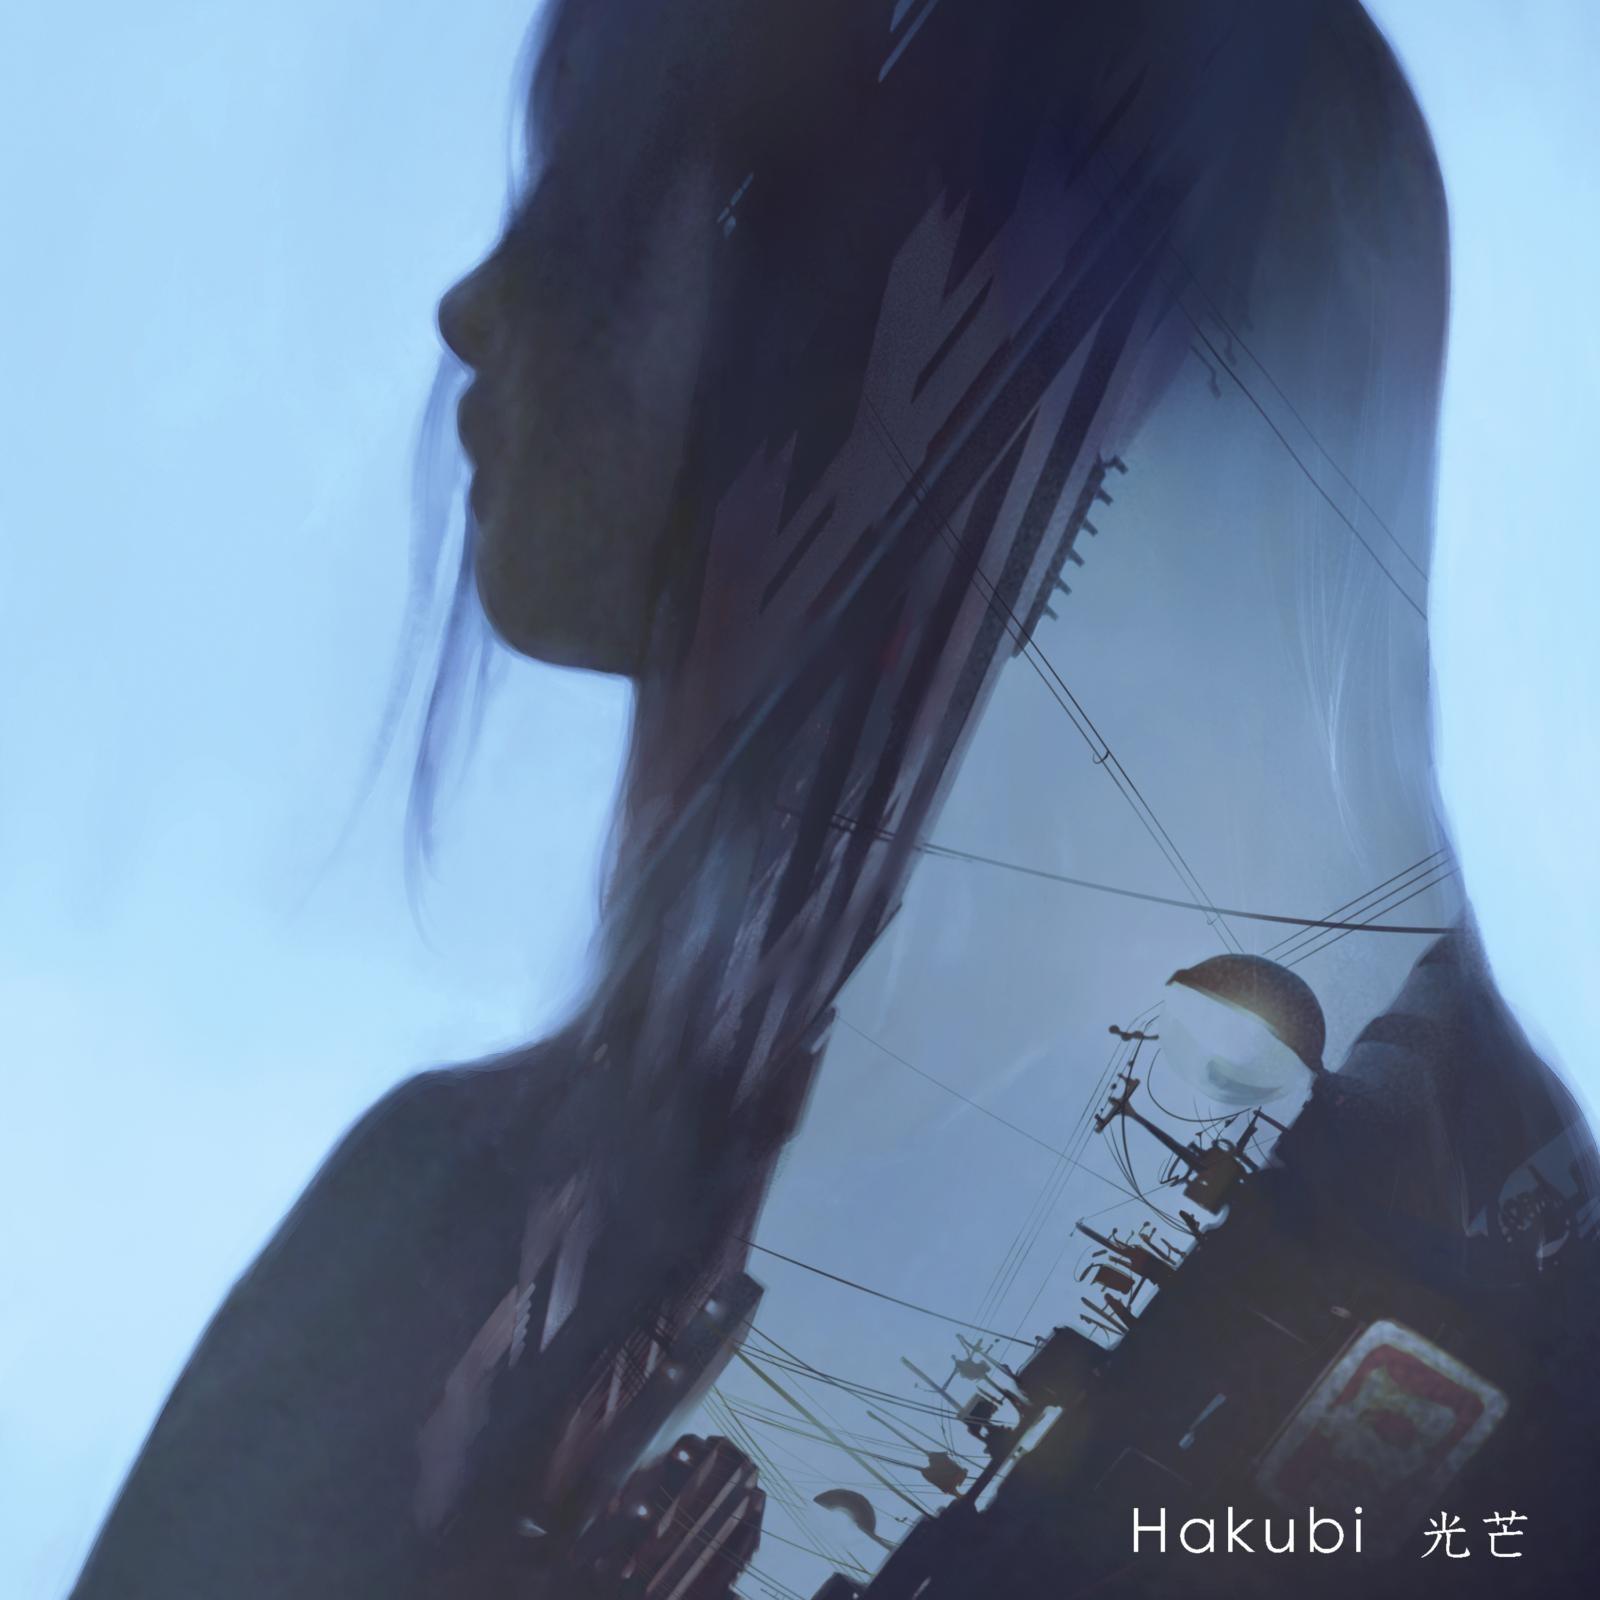 Hakubi – 光芒 [FLAC / WEB] [2019.04.03]